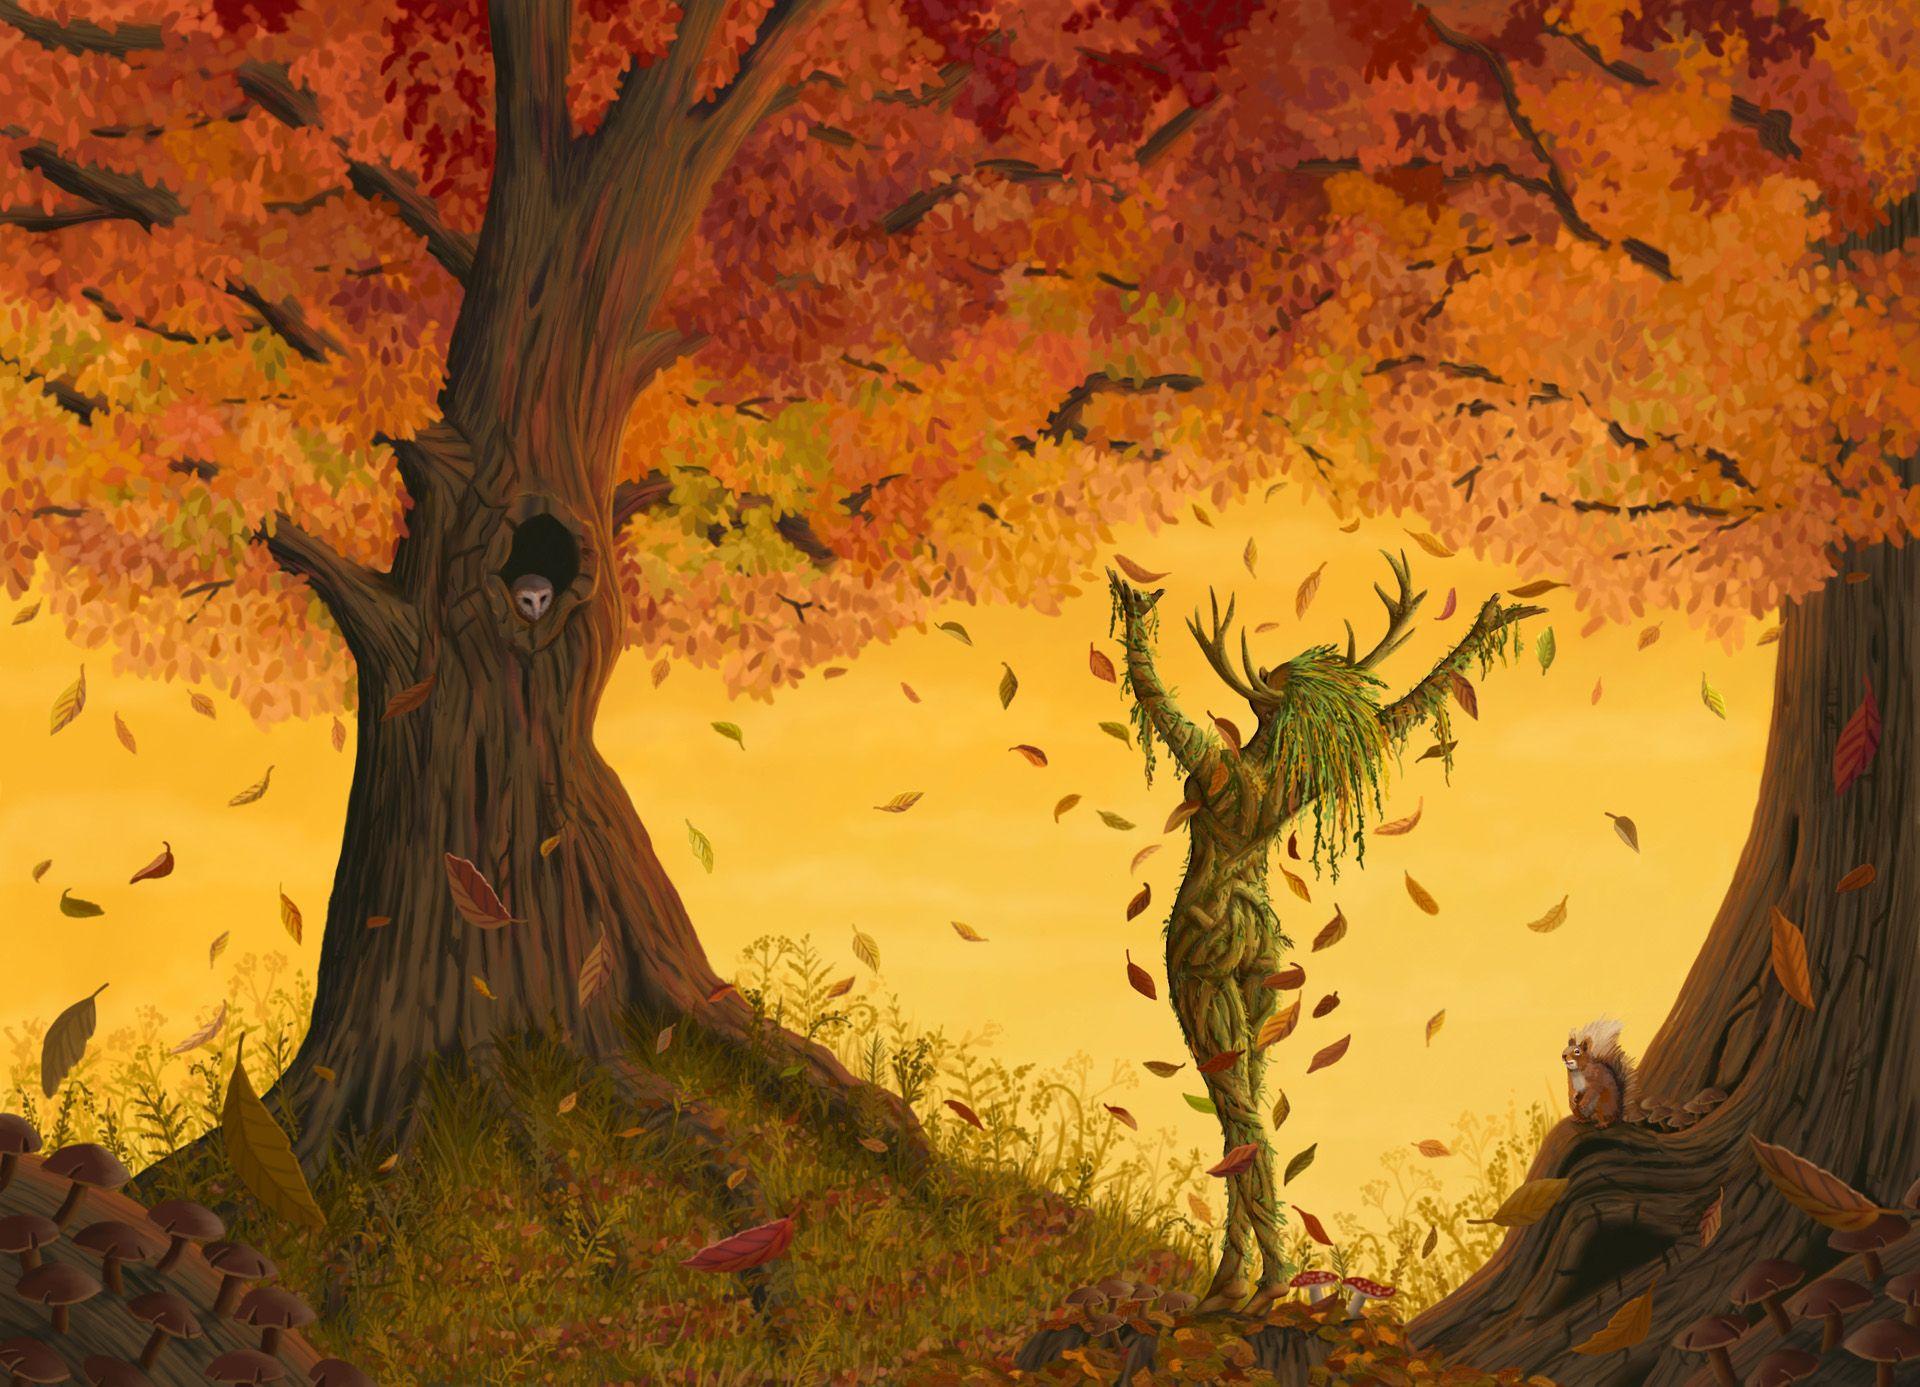 The Leaf Charmer  Fantasy Art & Illustration By Martin